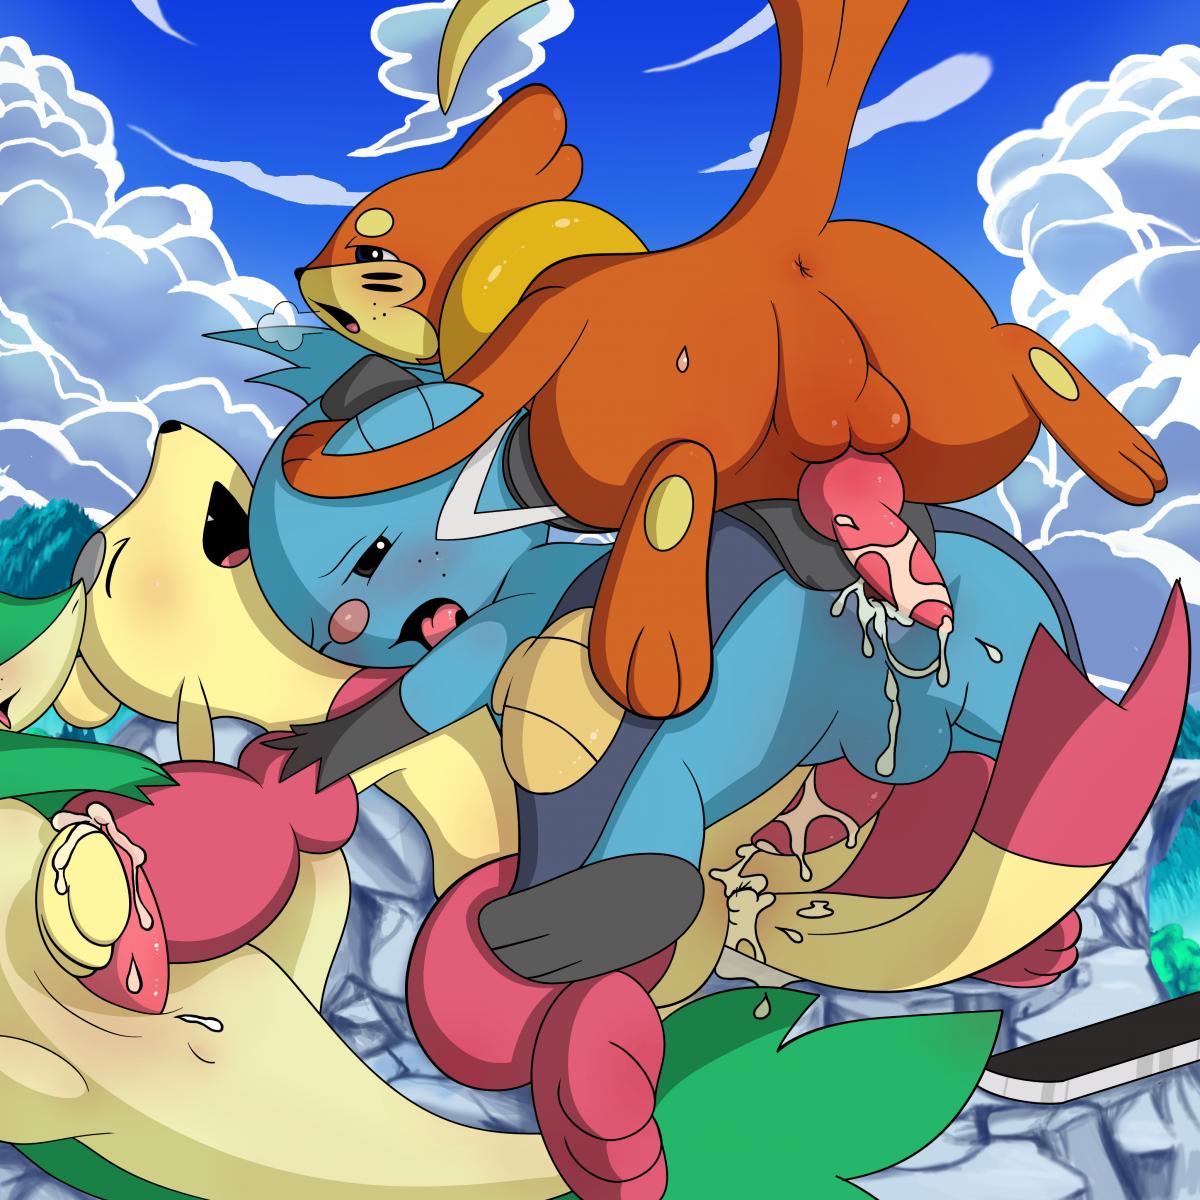 igrat-v-igru-pokemoni-seks